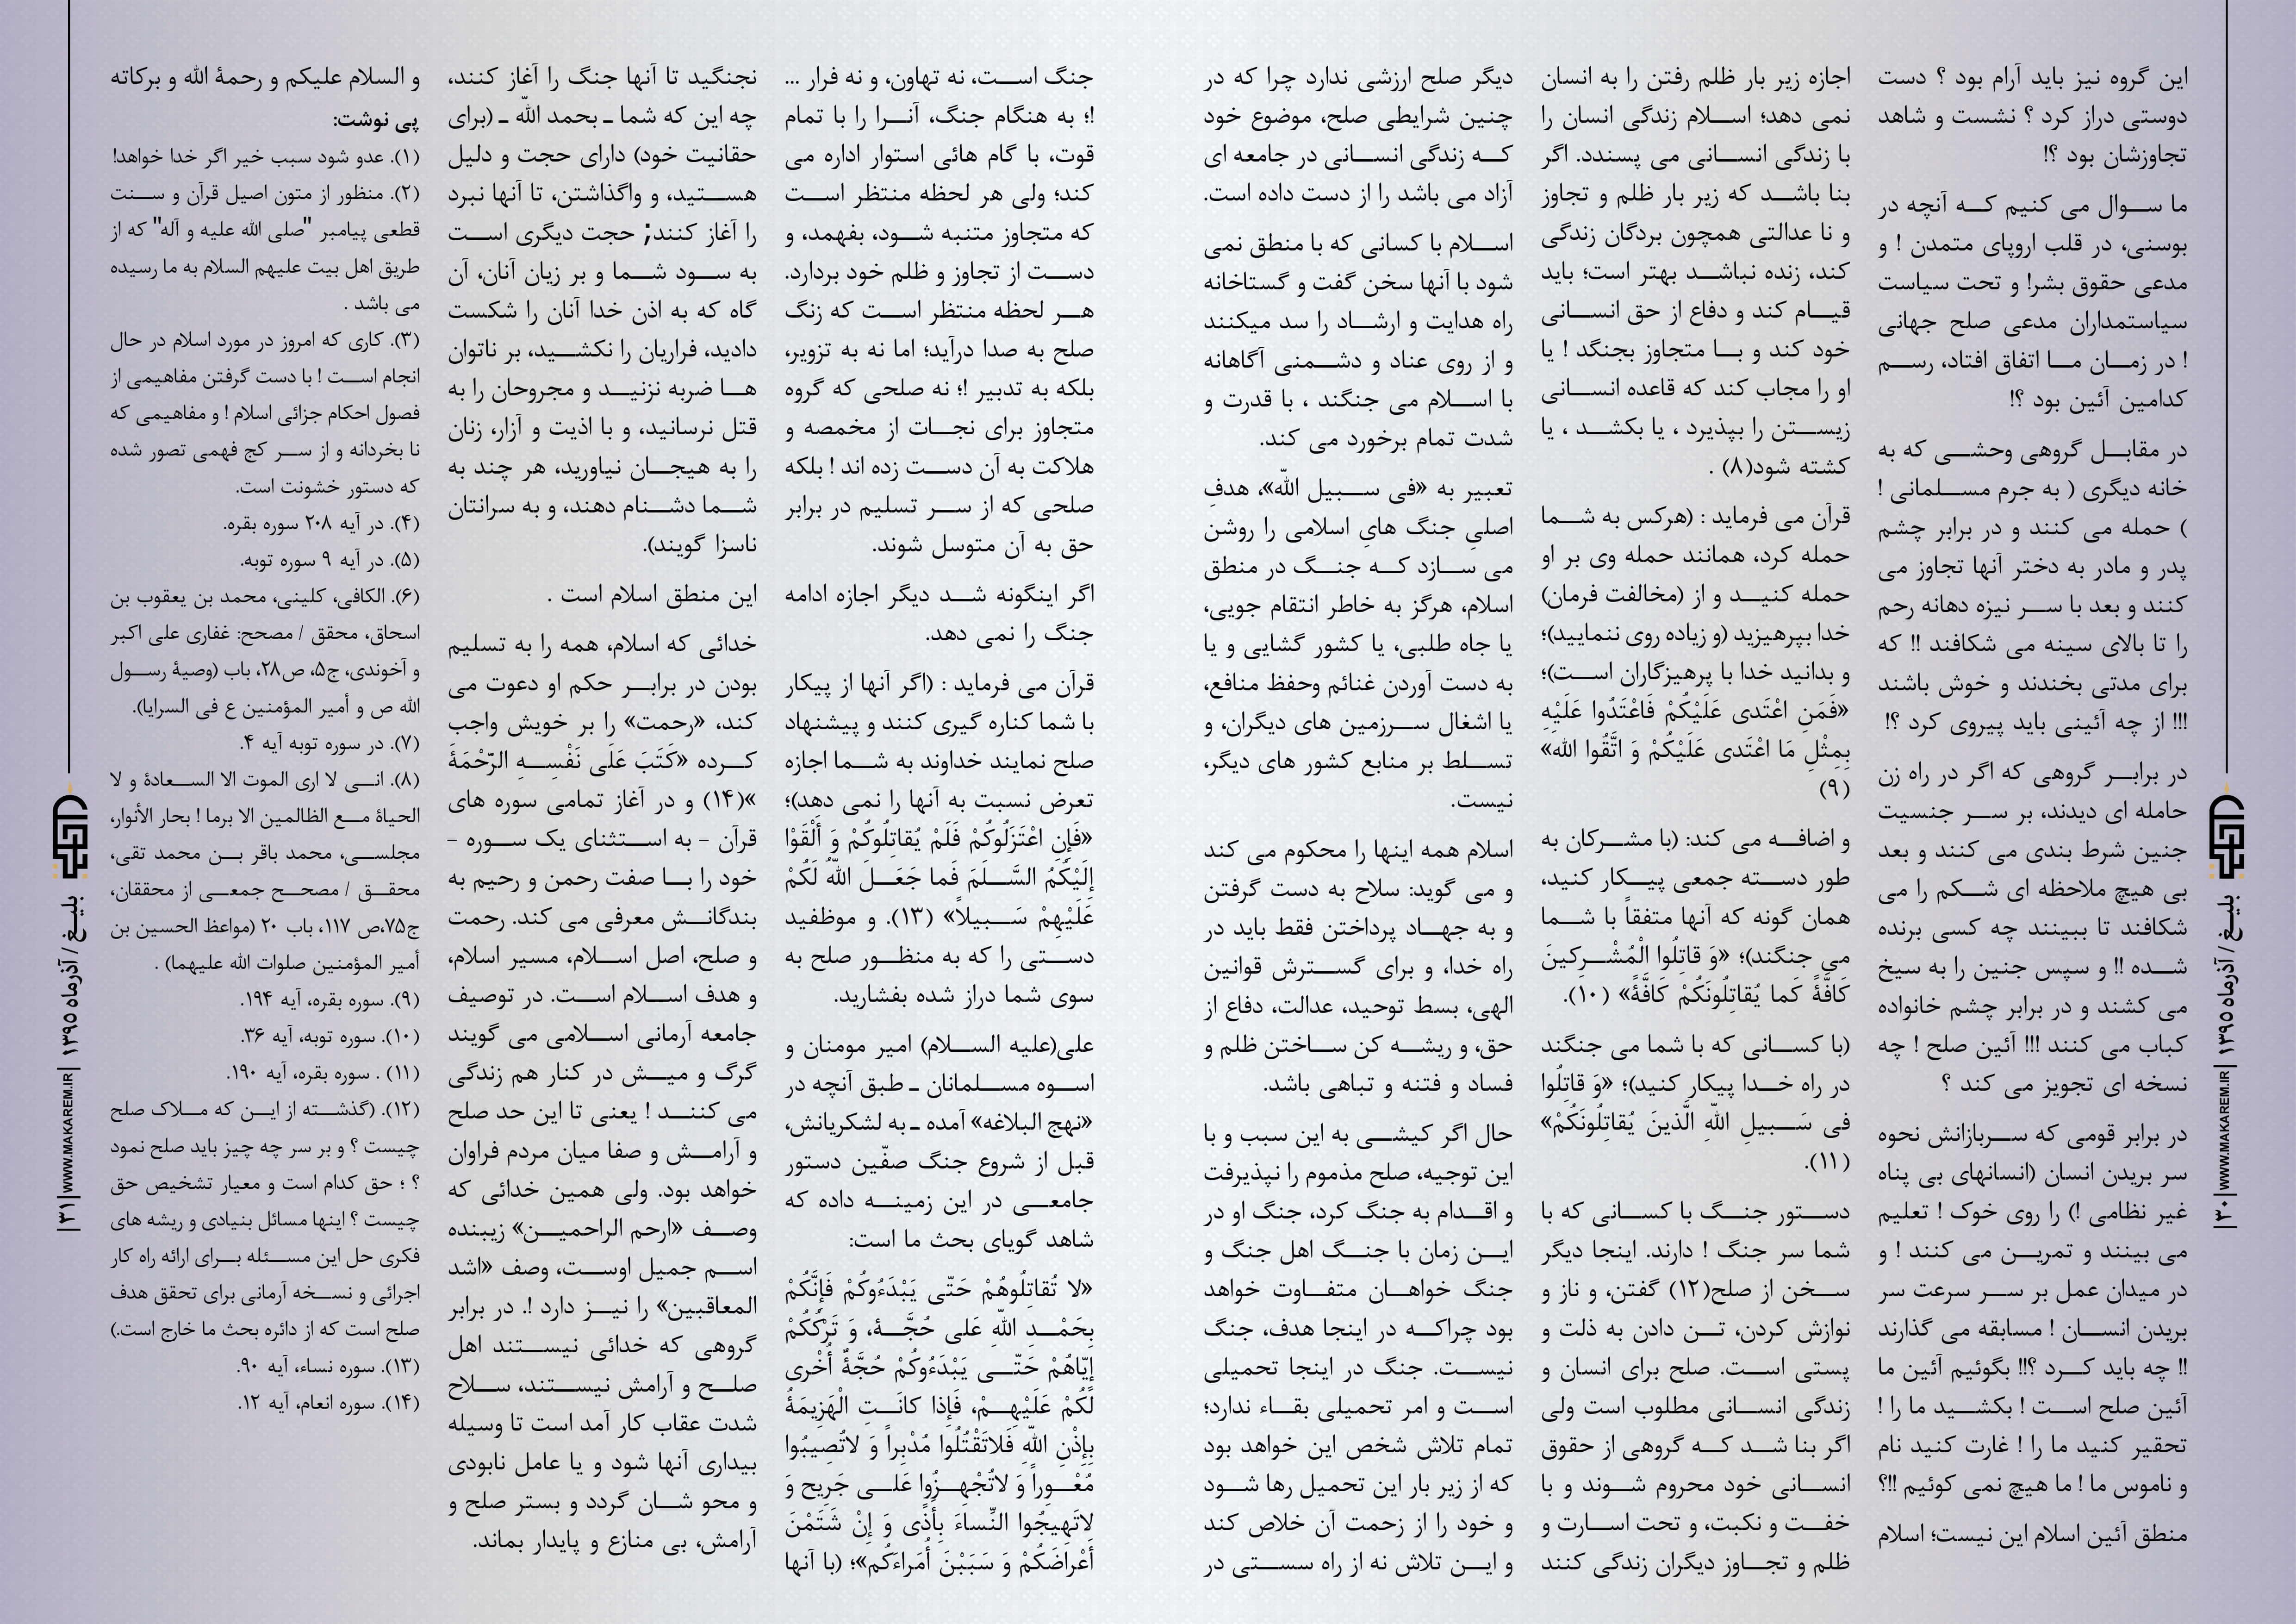 رابطه اسلام با صلح و جنگ-مدرسه الامام امیر المومنین (ع)